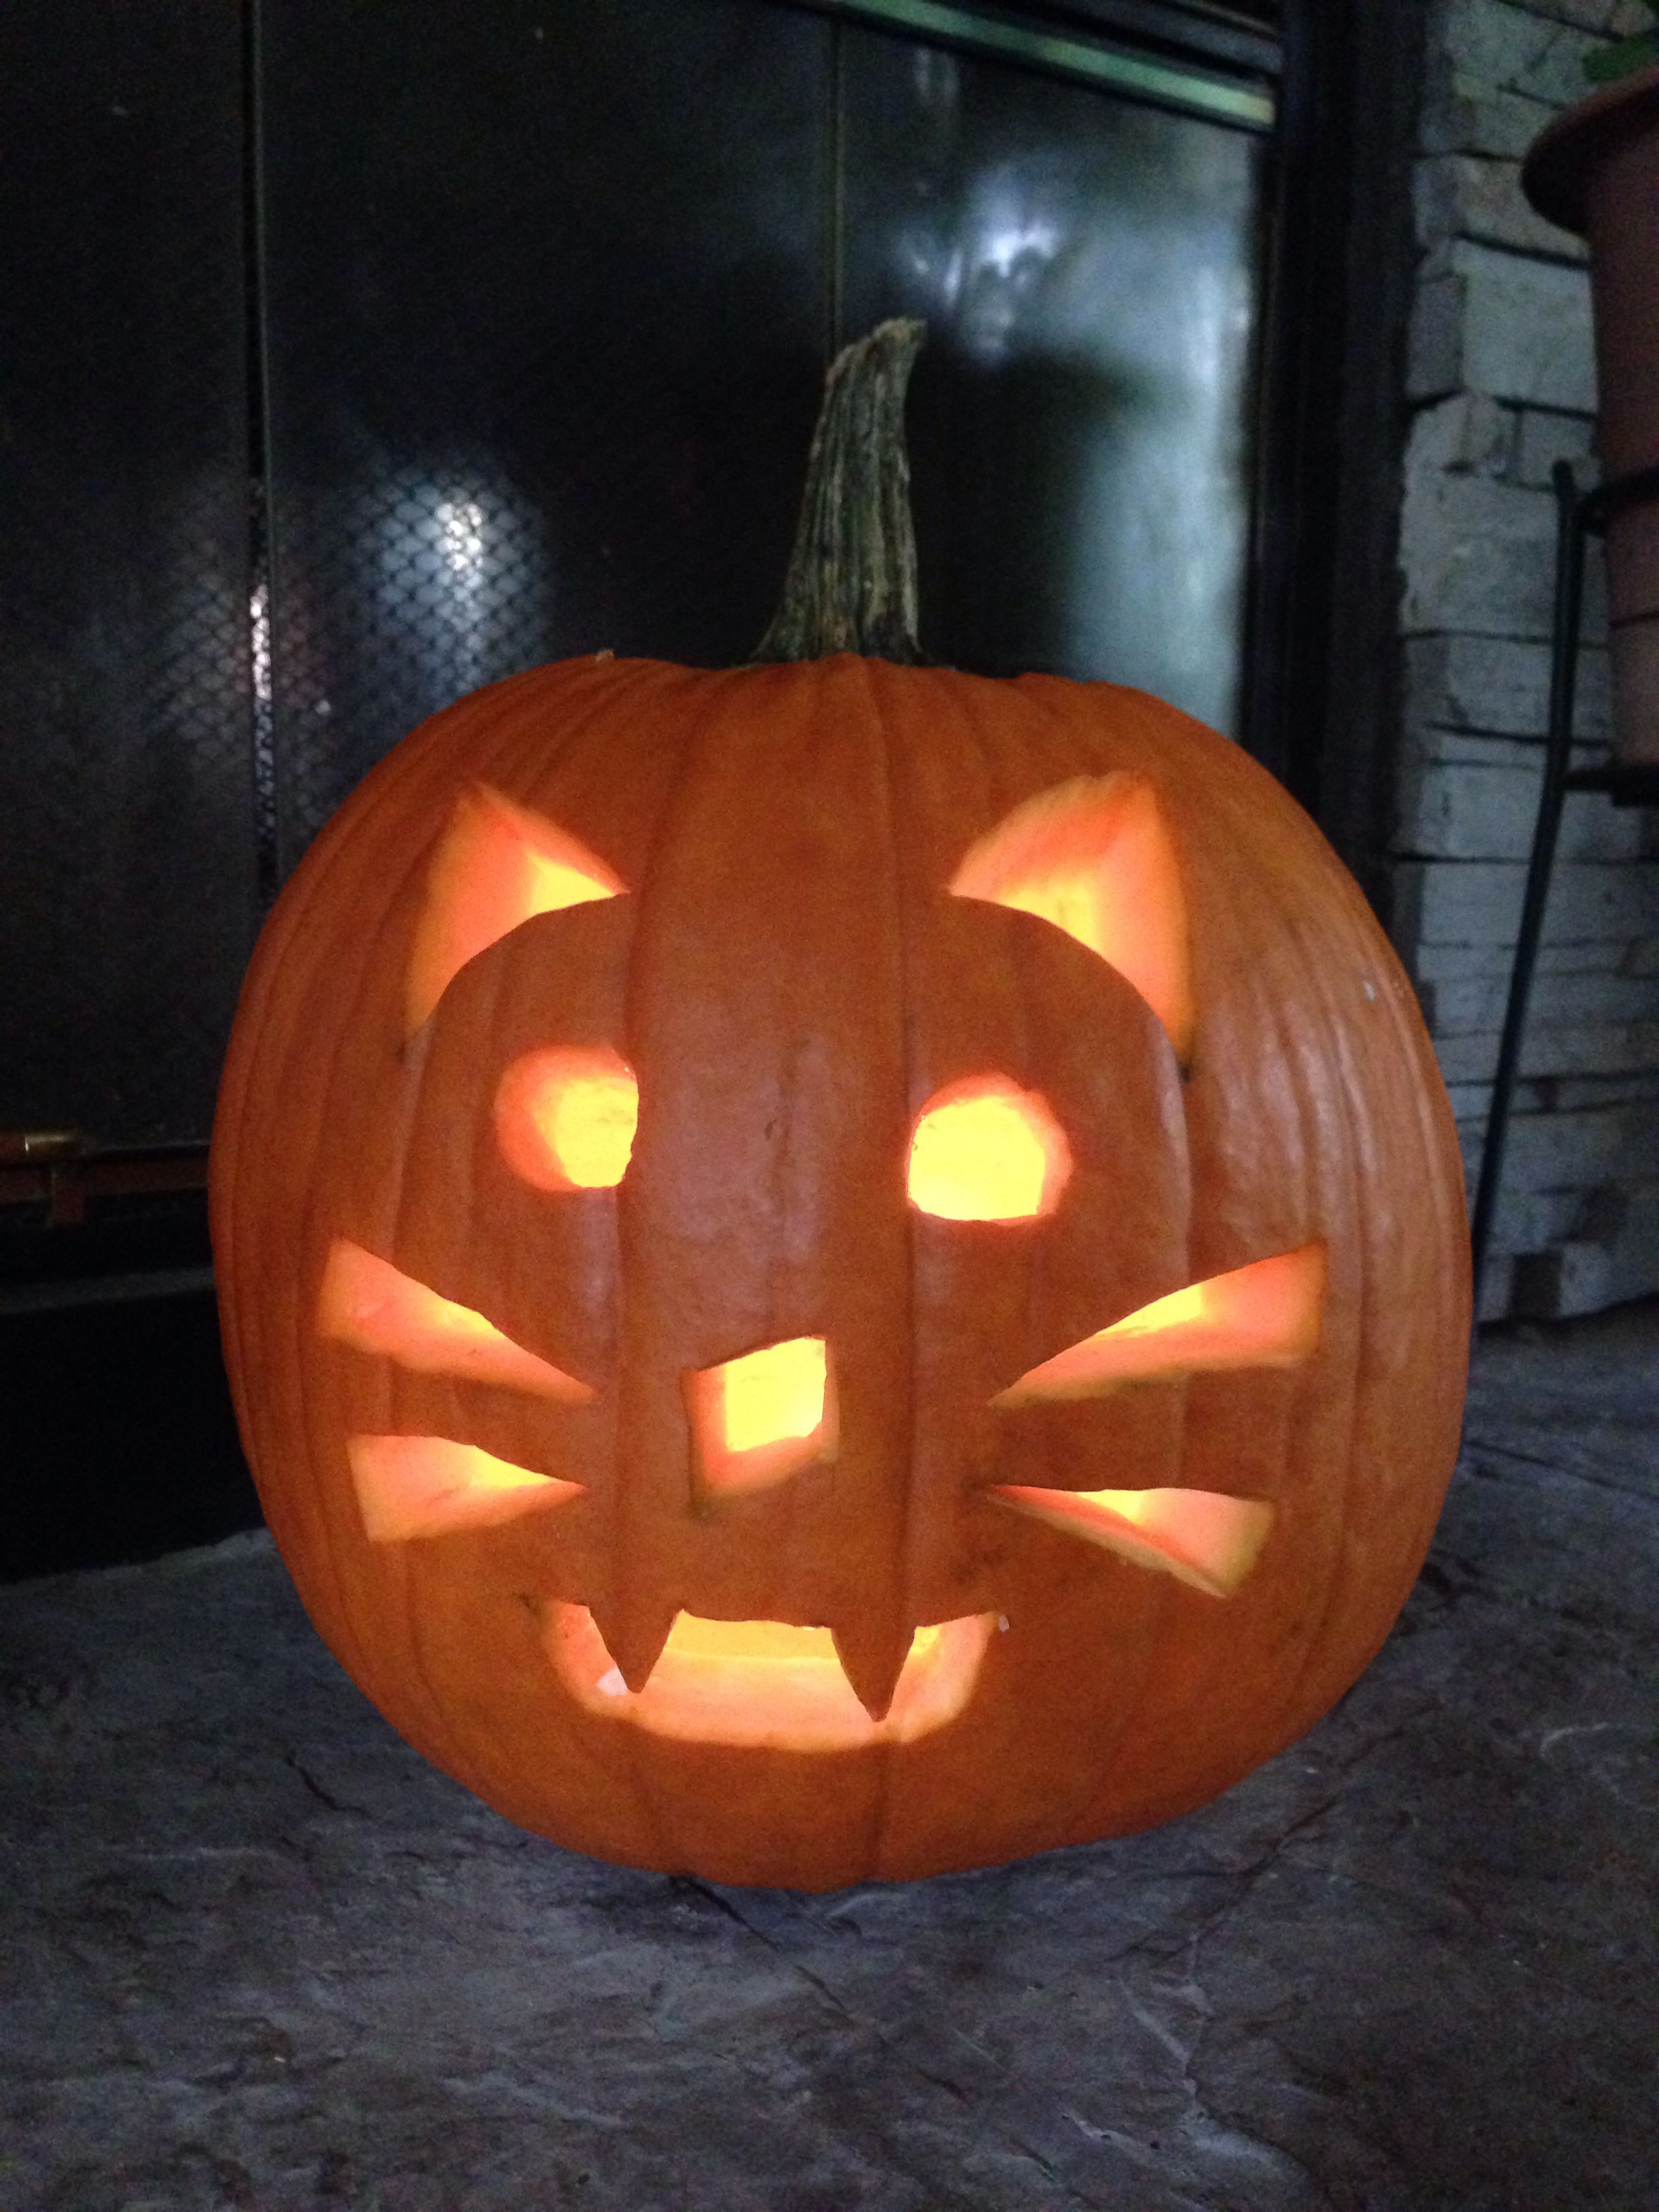 Easy Cat Jack O Lantern Stencil - cuteanimalsCat Jack O Lantern Patterns